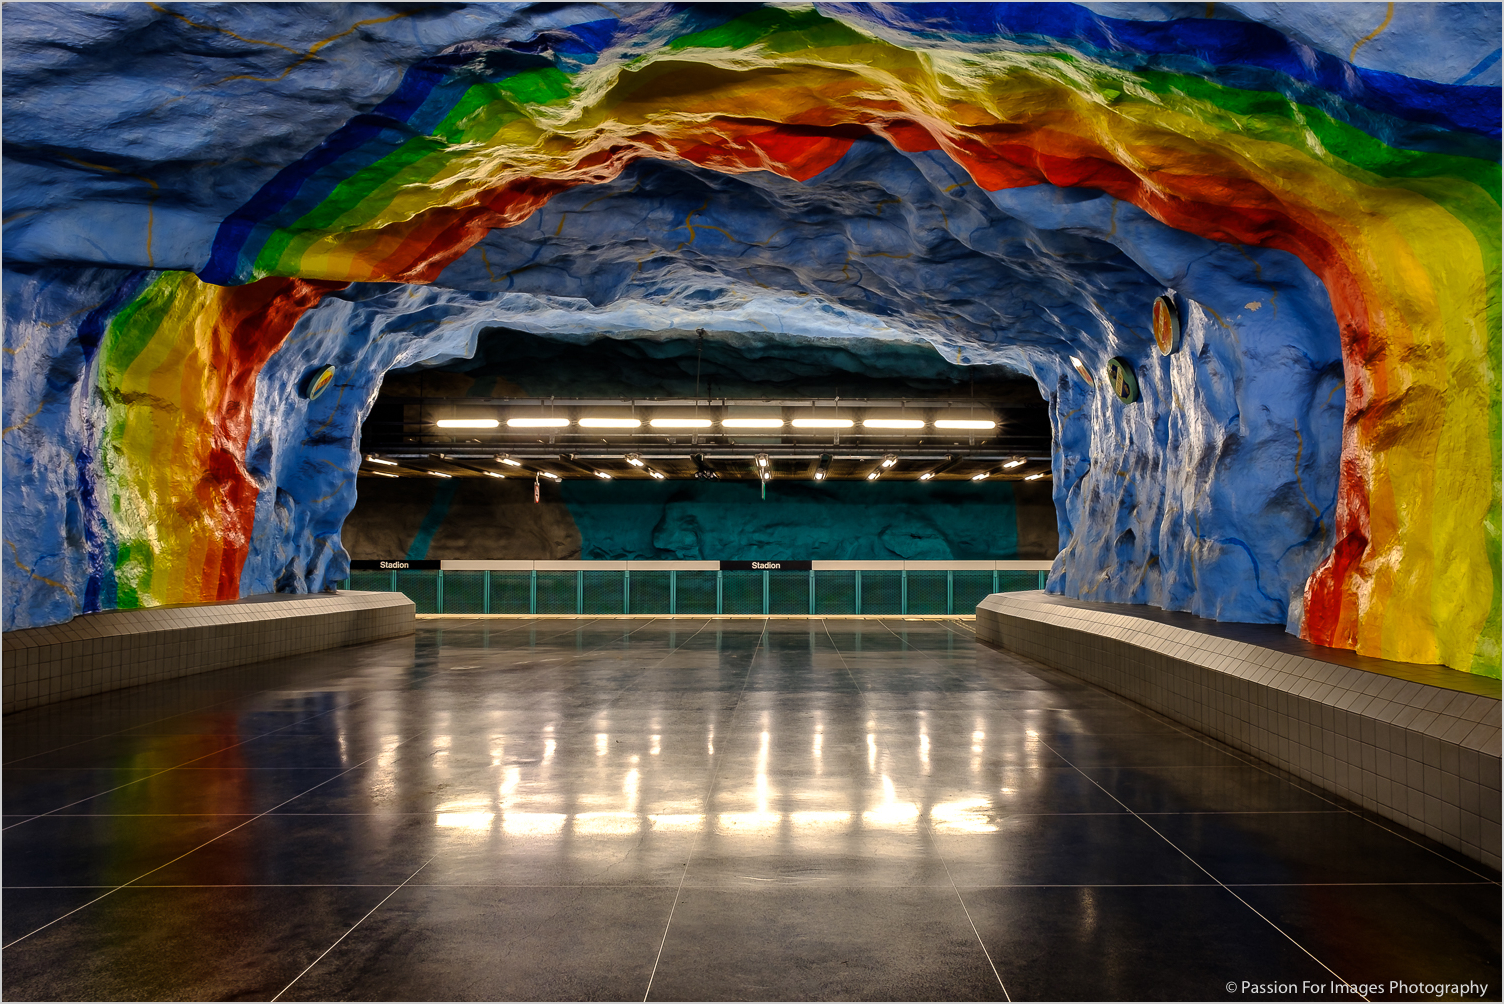 DSCF8756_2019_08_Skandinavien-Subway-Stockholm-Art-Project.jpg